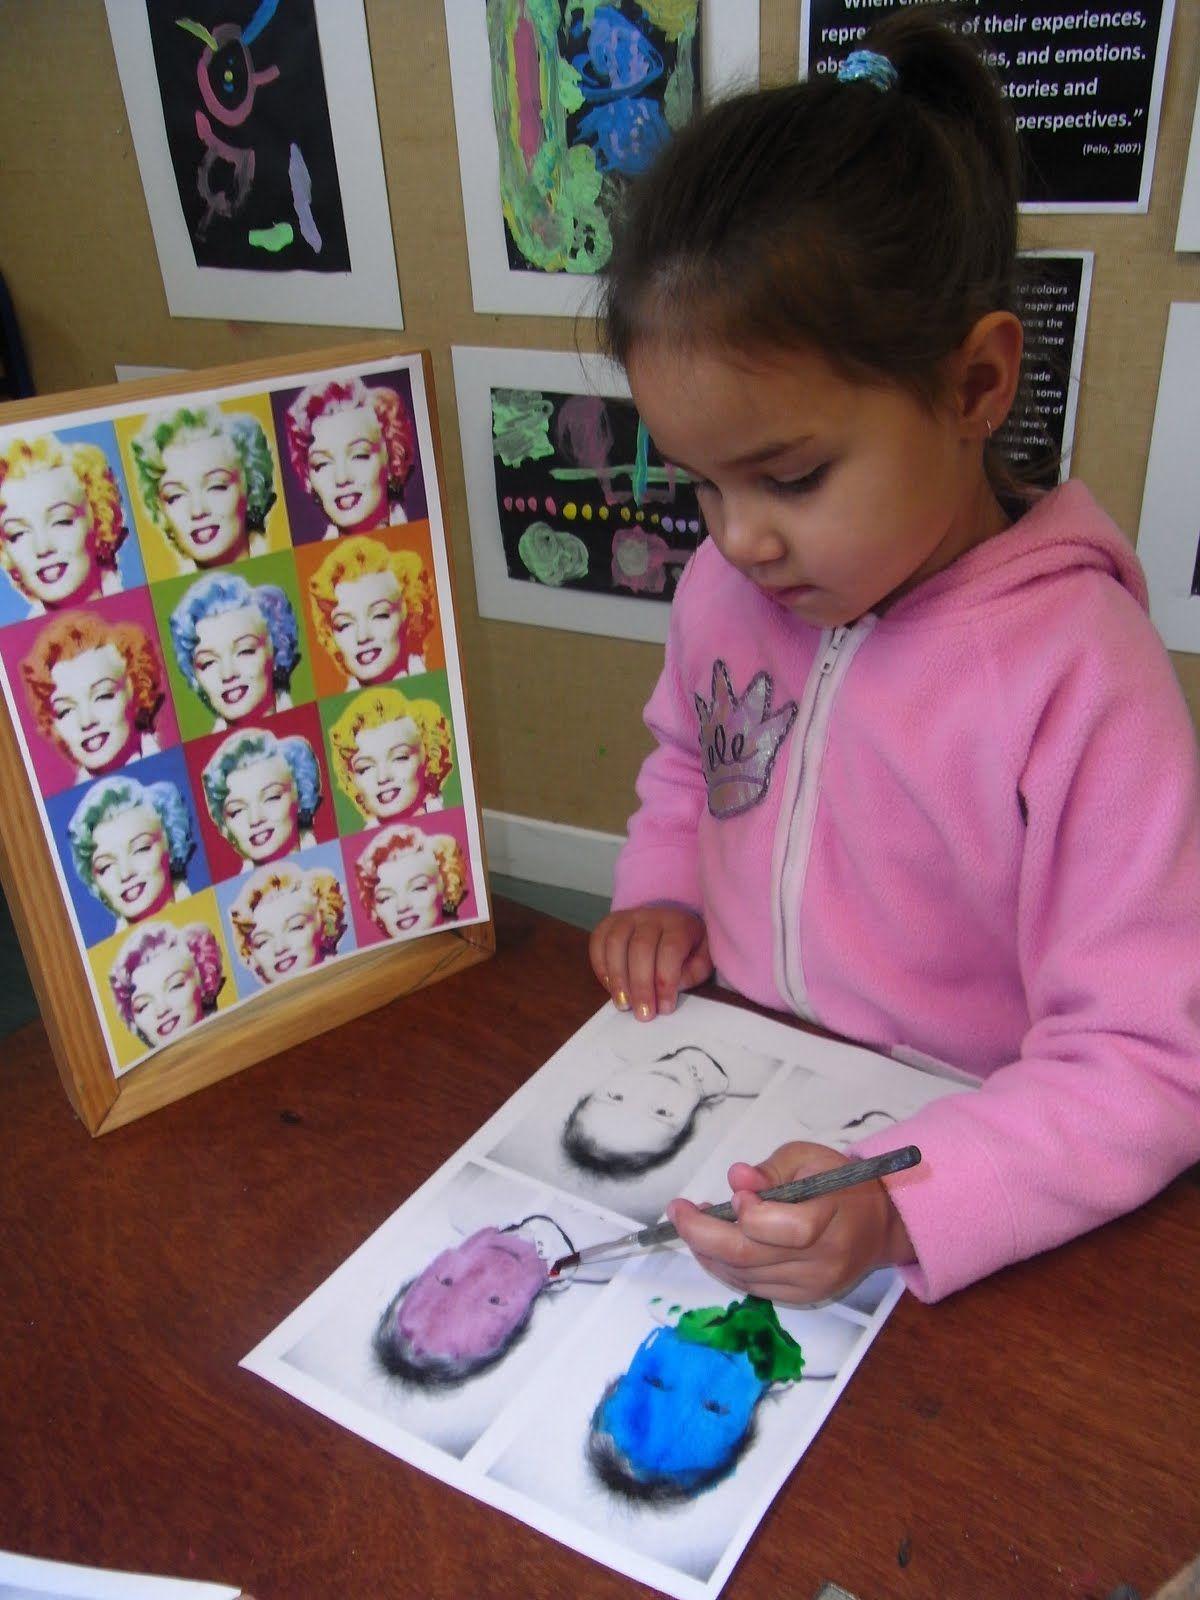 Andy Warhol For Kindergarten